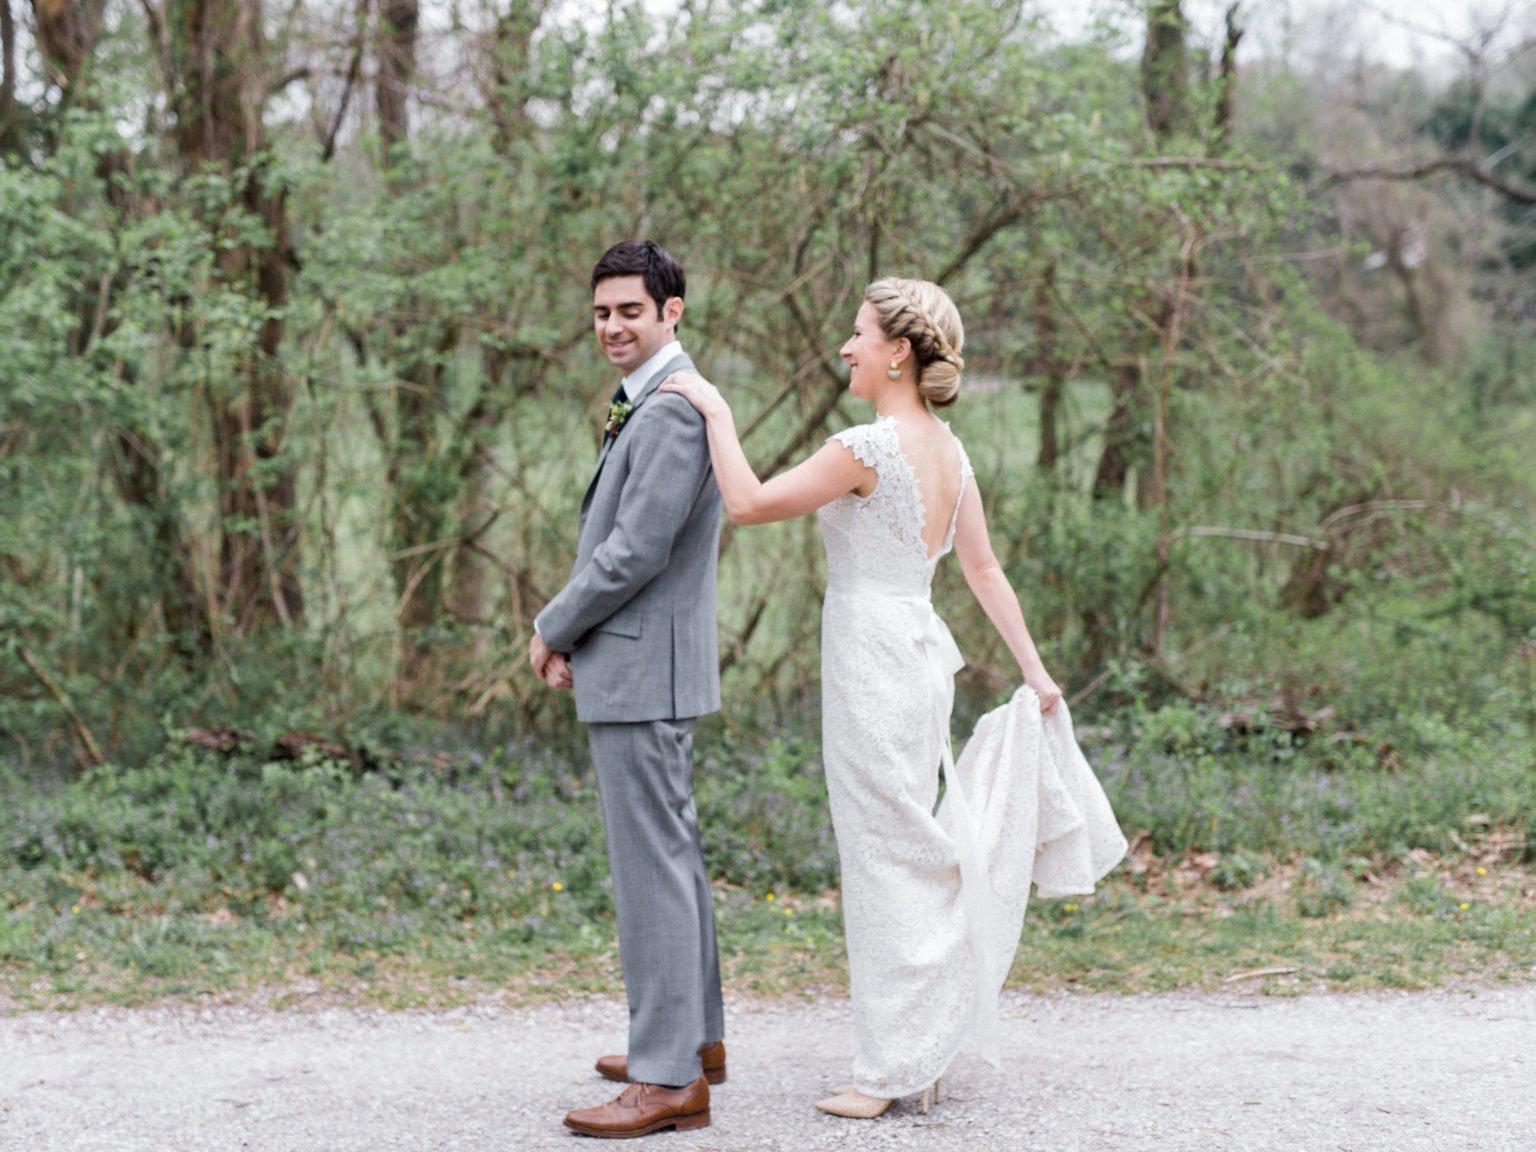 Liz McAvoy + John Gabriel Linen Mills House Wedding | Renee Hollingshead137